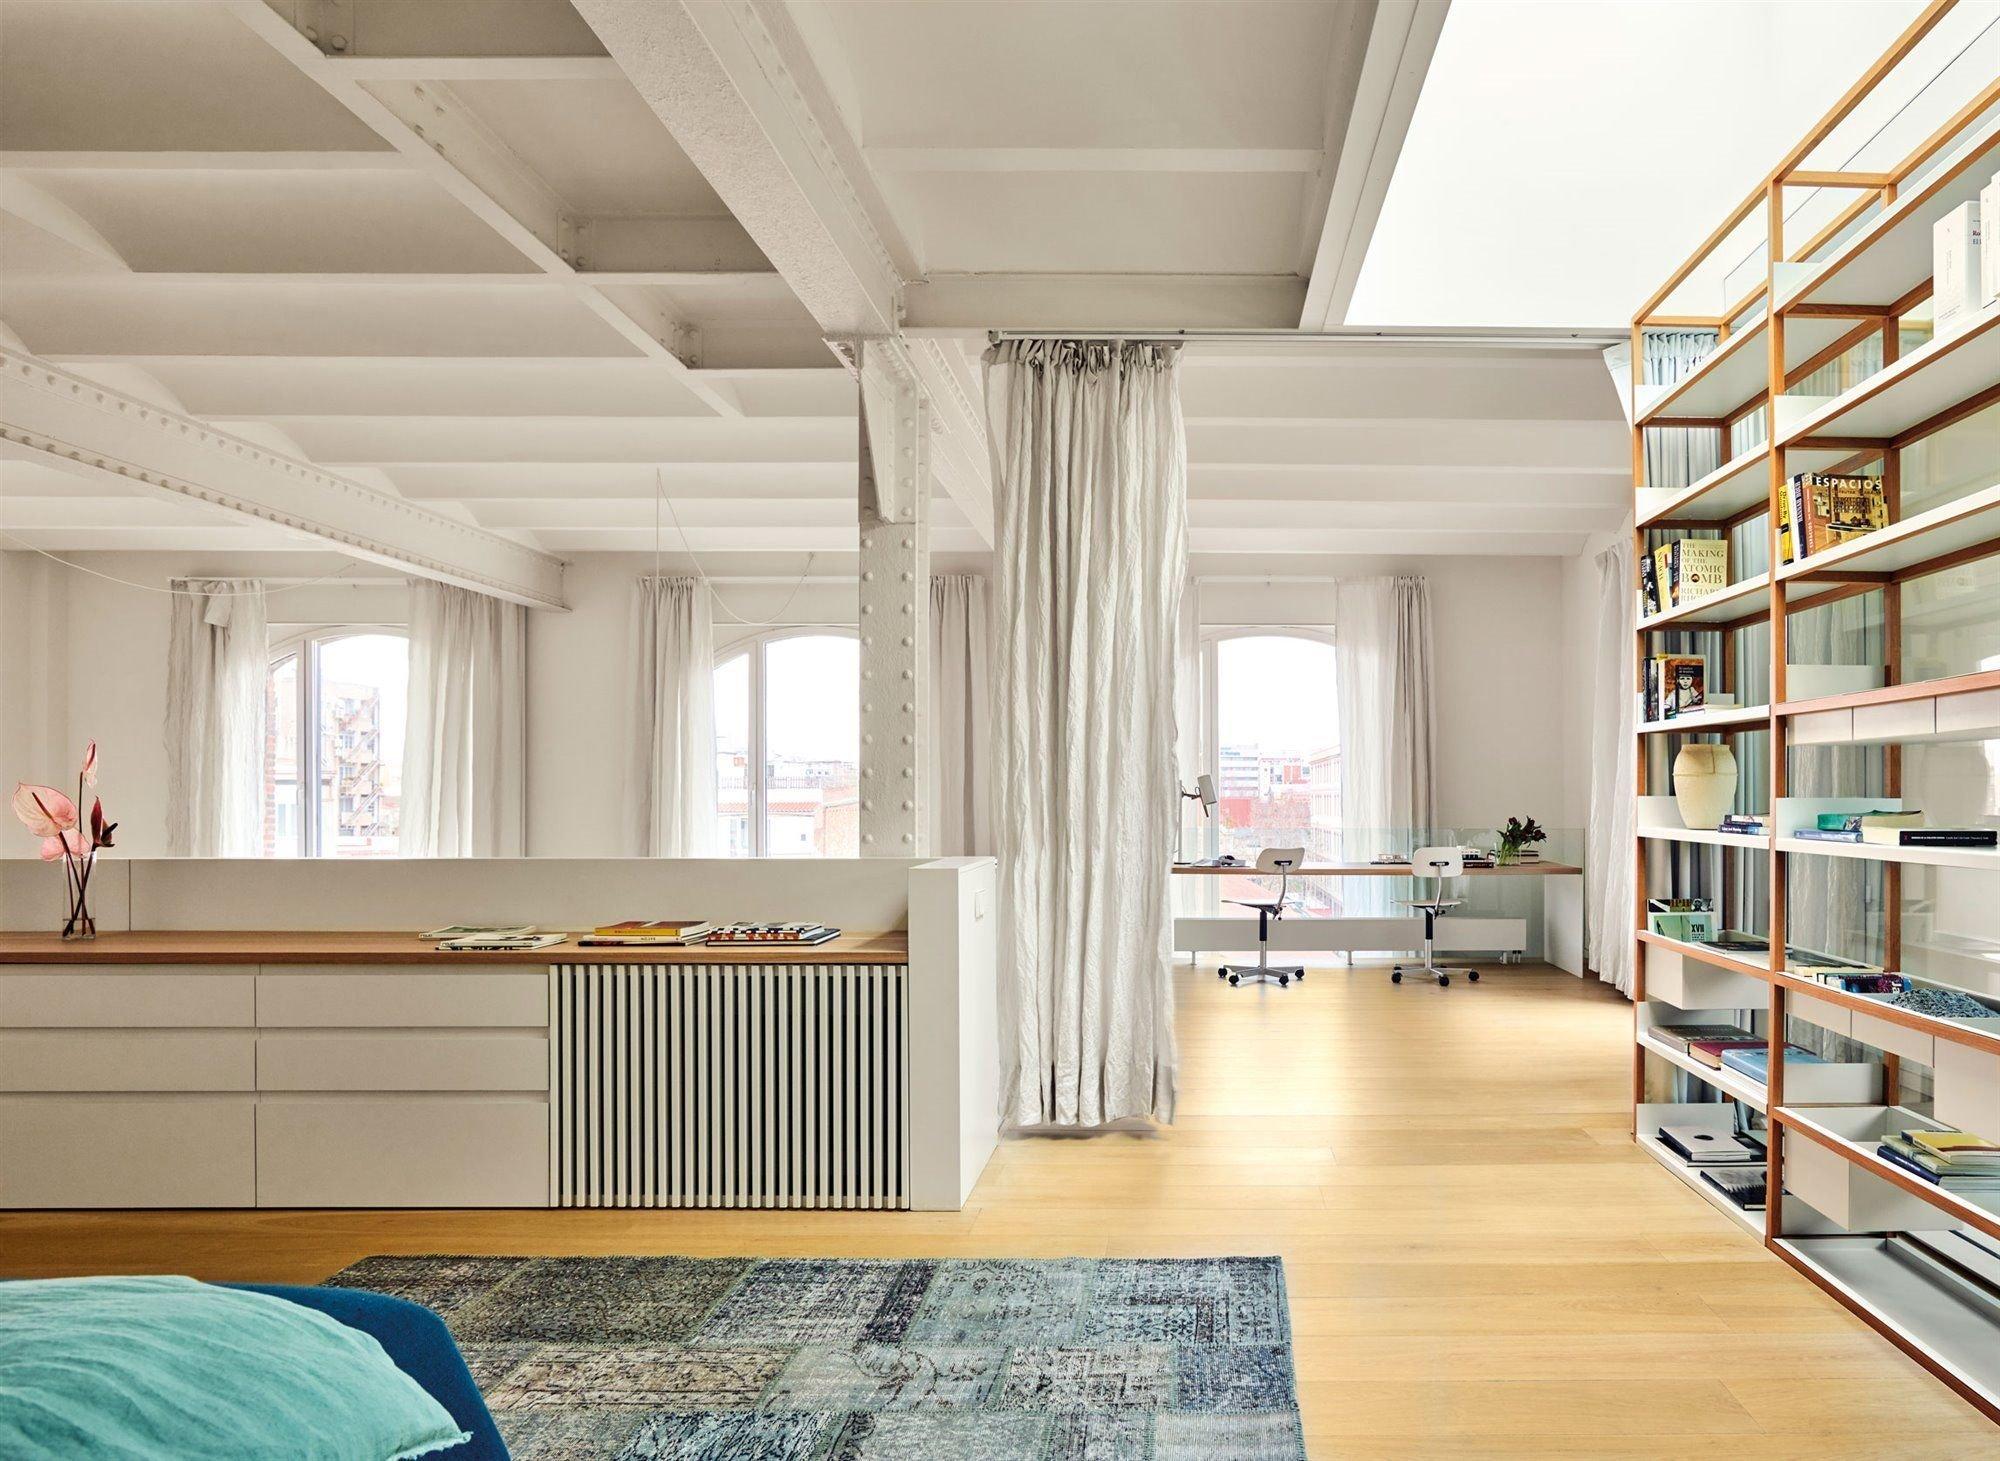 cortinas dividir ambientes prego e martelo